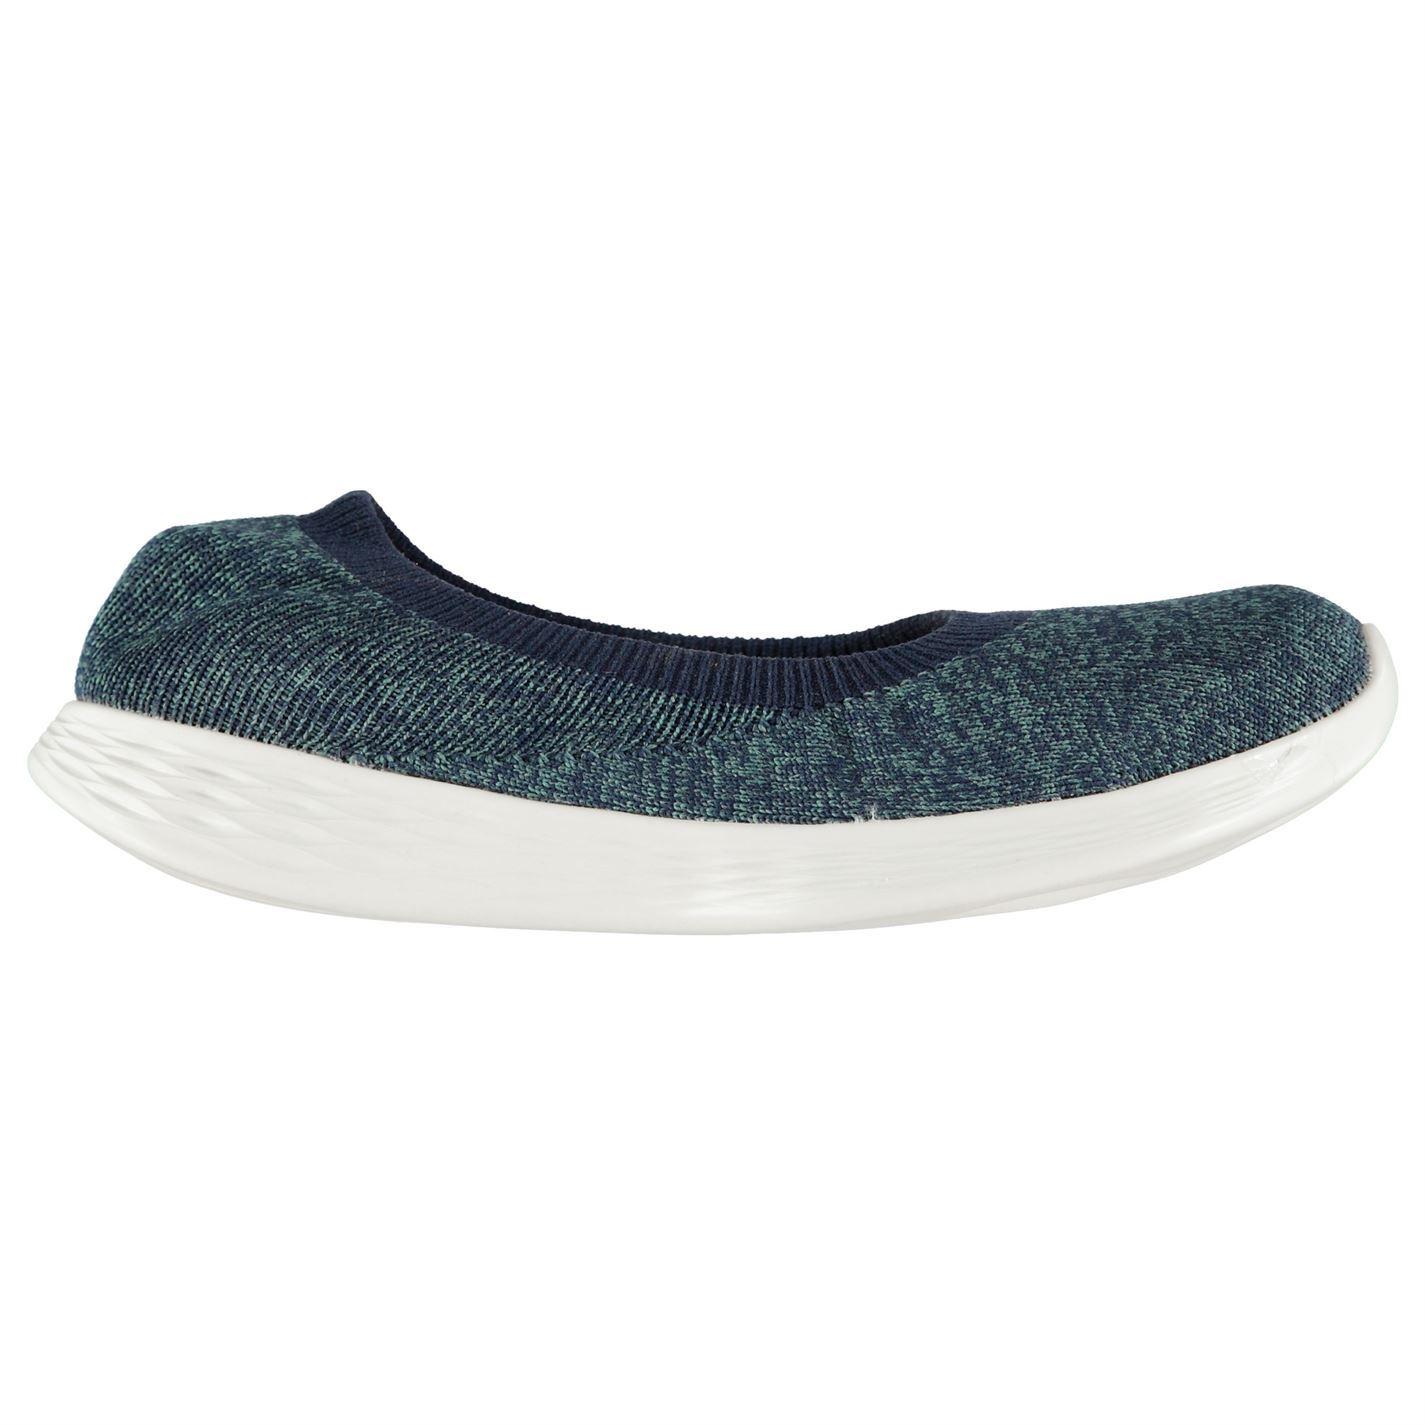 Skechers Damenschuhe YOU Define Slip Flat On Trainers Lightweight Flat Slip Knit Knitted b0e563